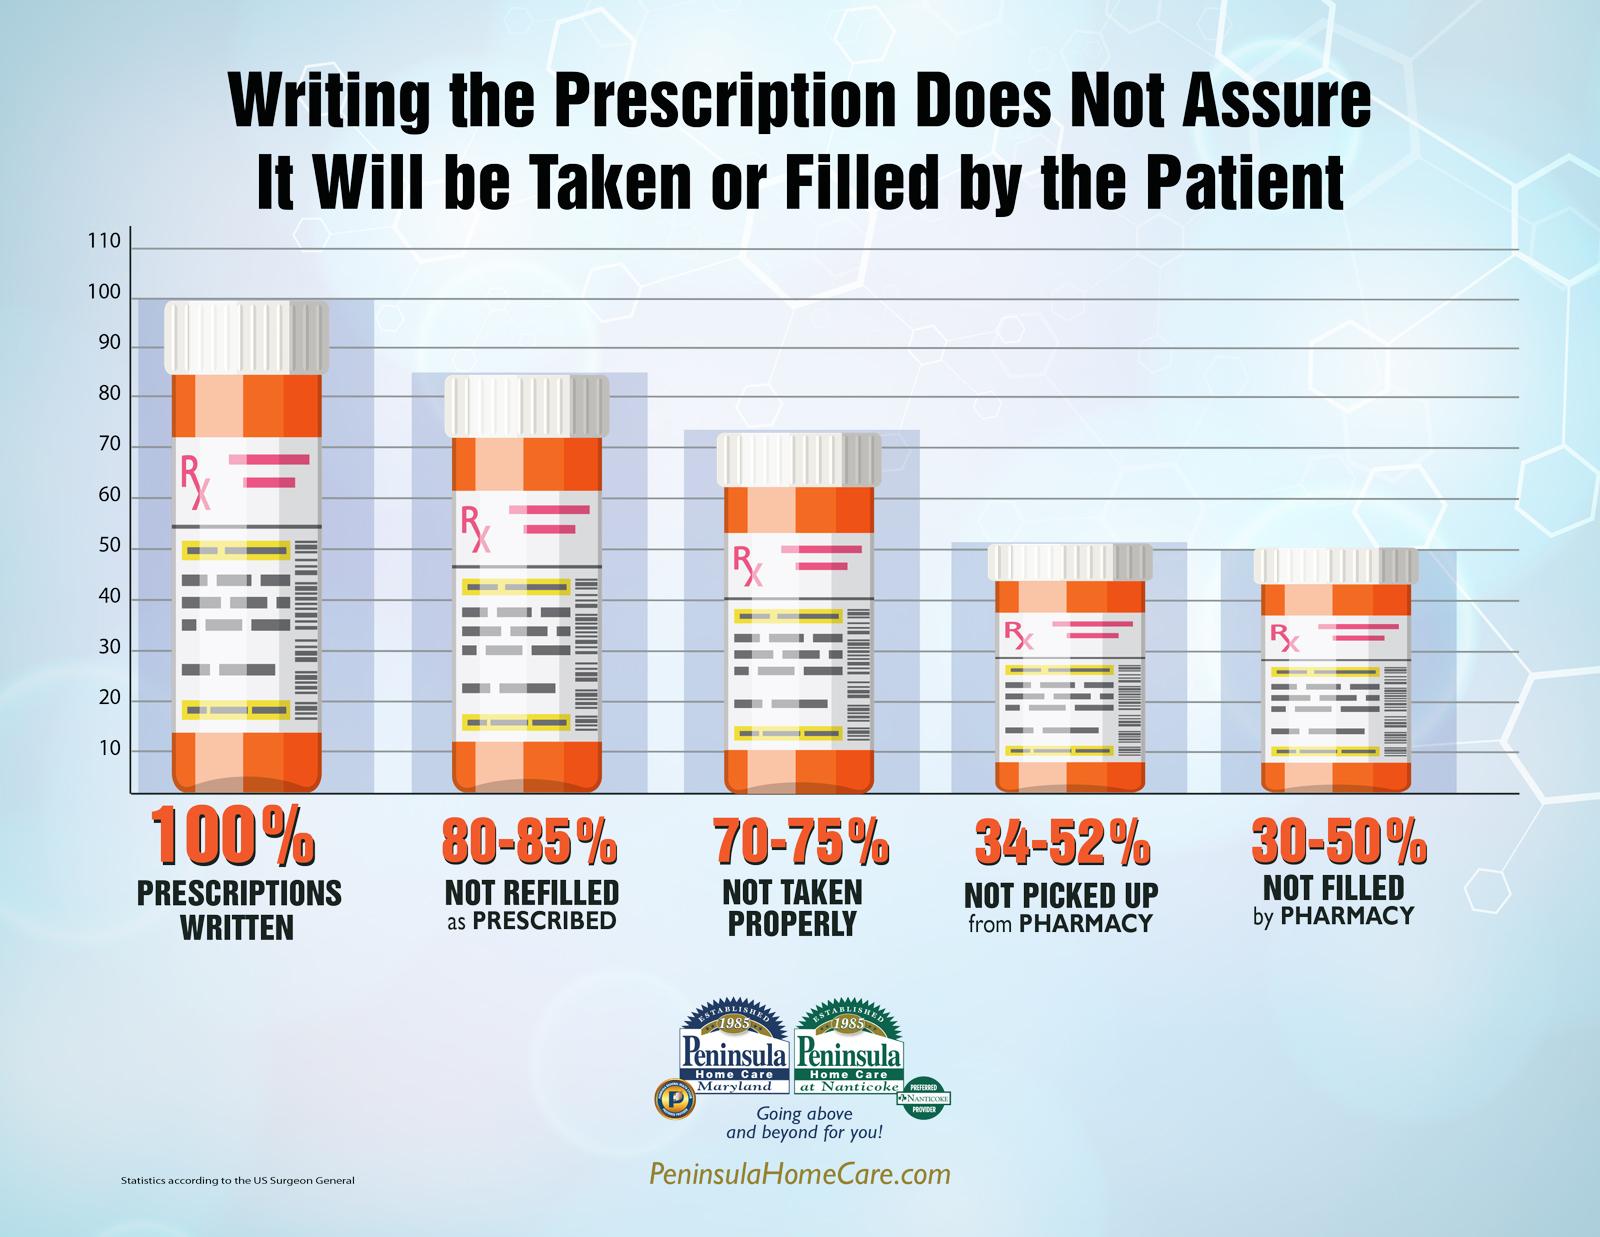 Peninsula Home Care Educates On Medication Management